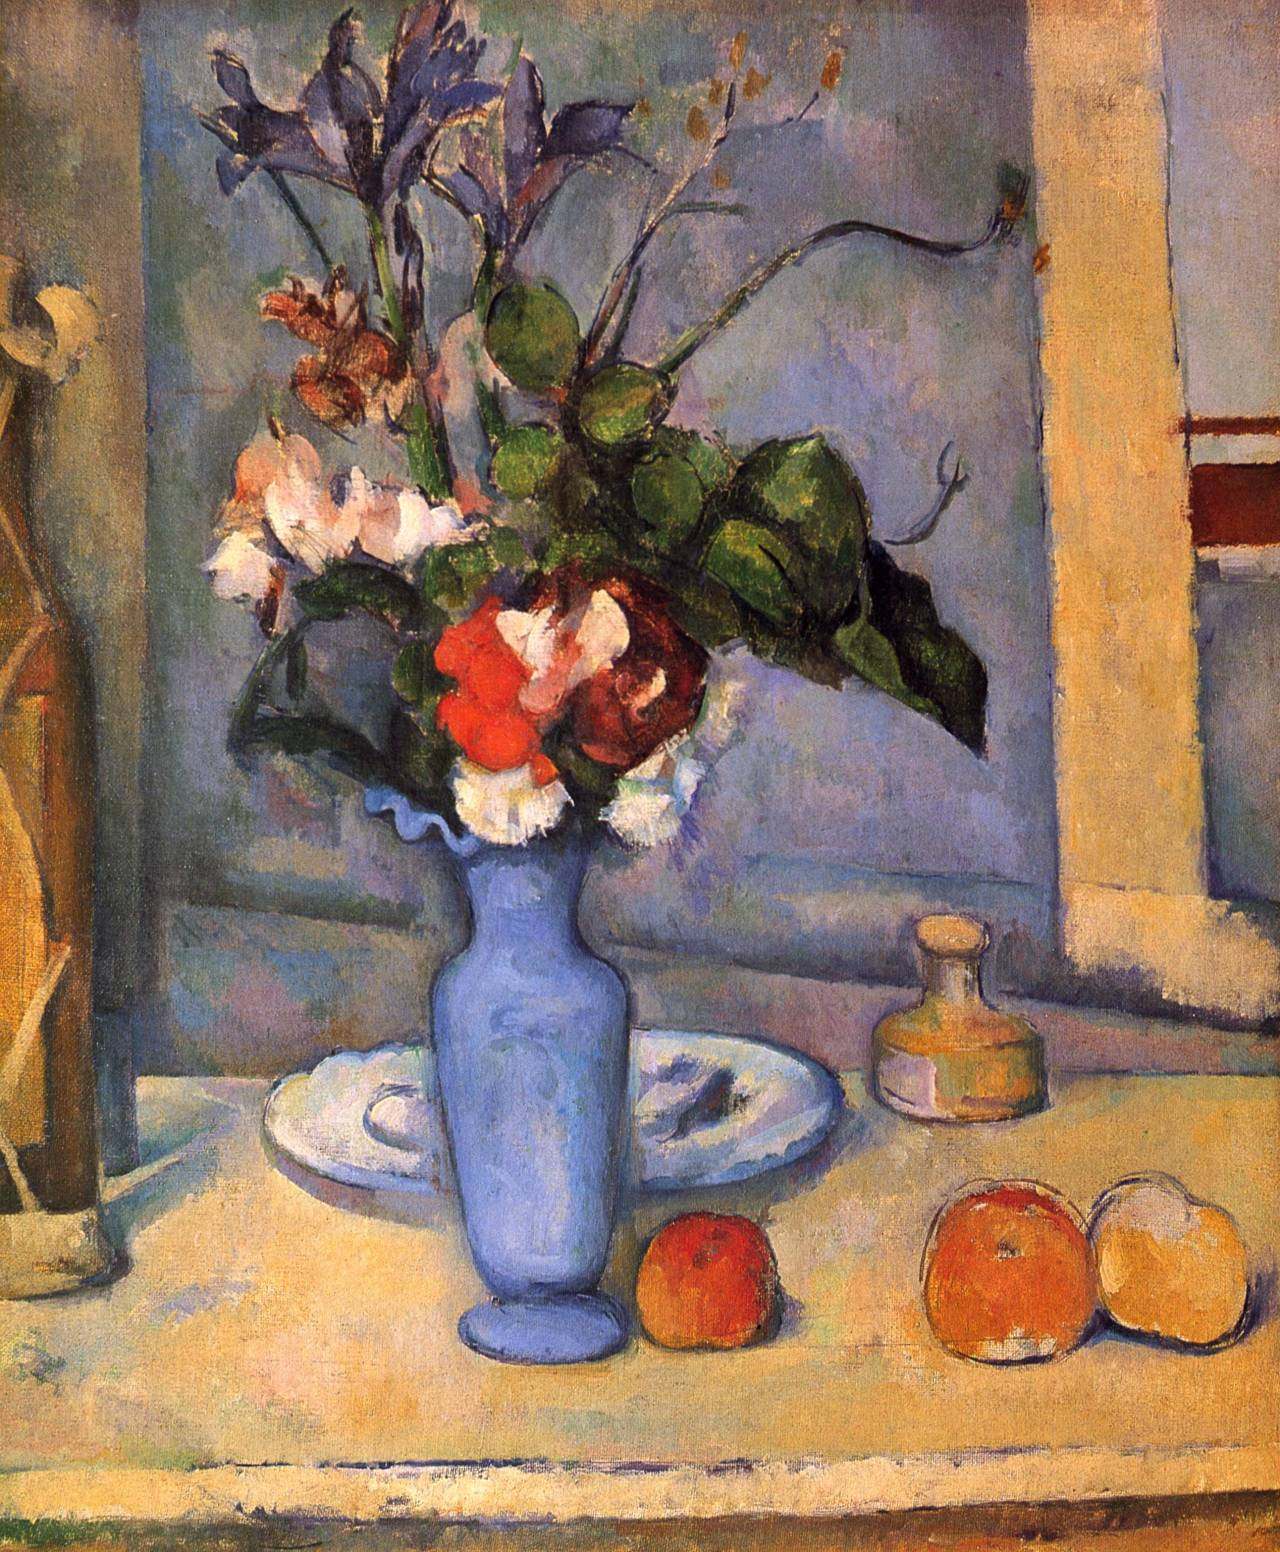 herzogtum-sachsen-weissenfels: Paul Cézanne (French, 1839-1906), Still Life with a Blue Vase, 1885-87. Oil on canvas,61 x 51 cm.